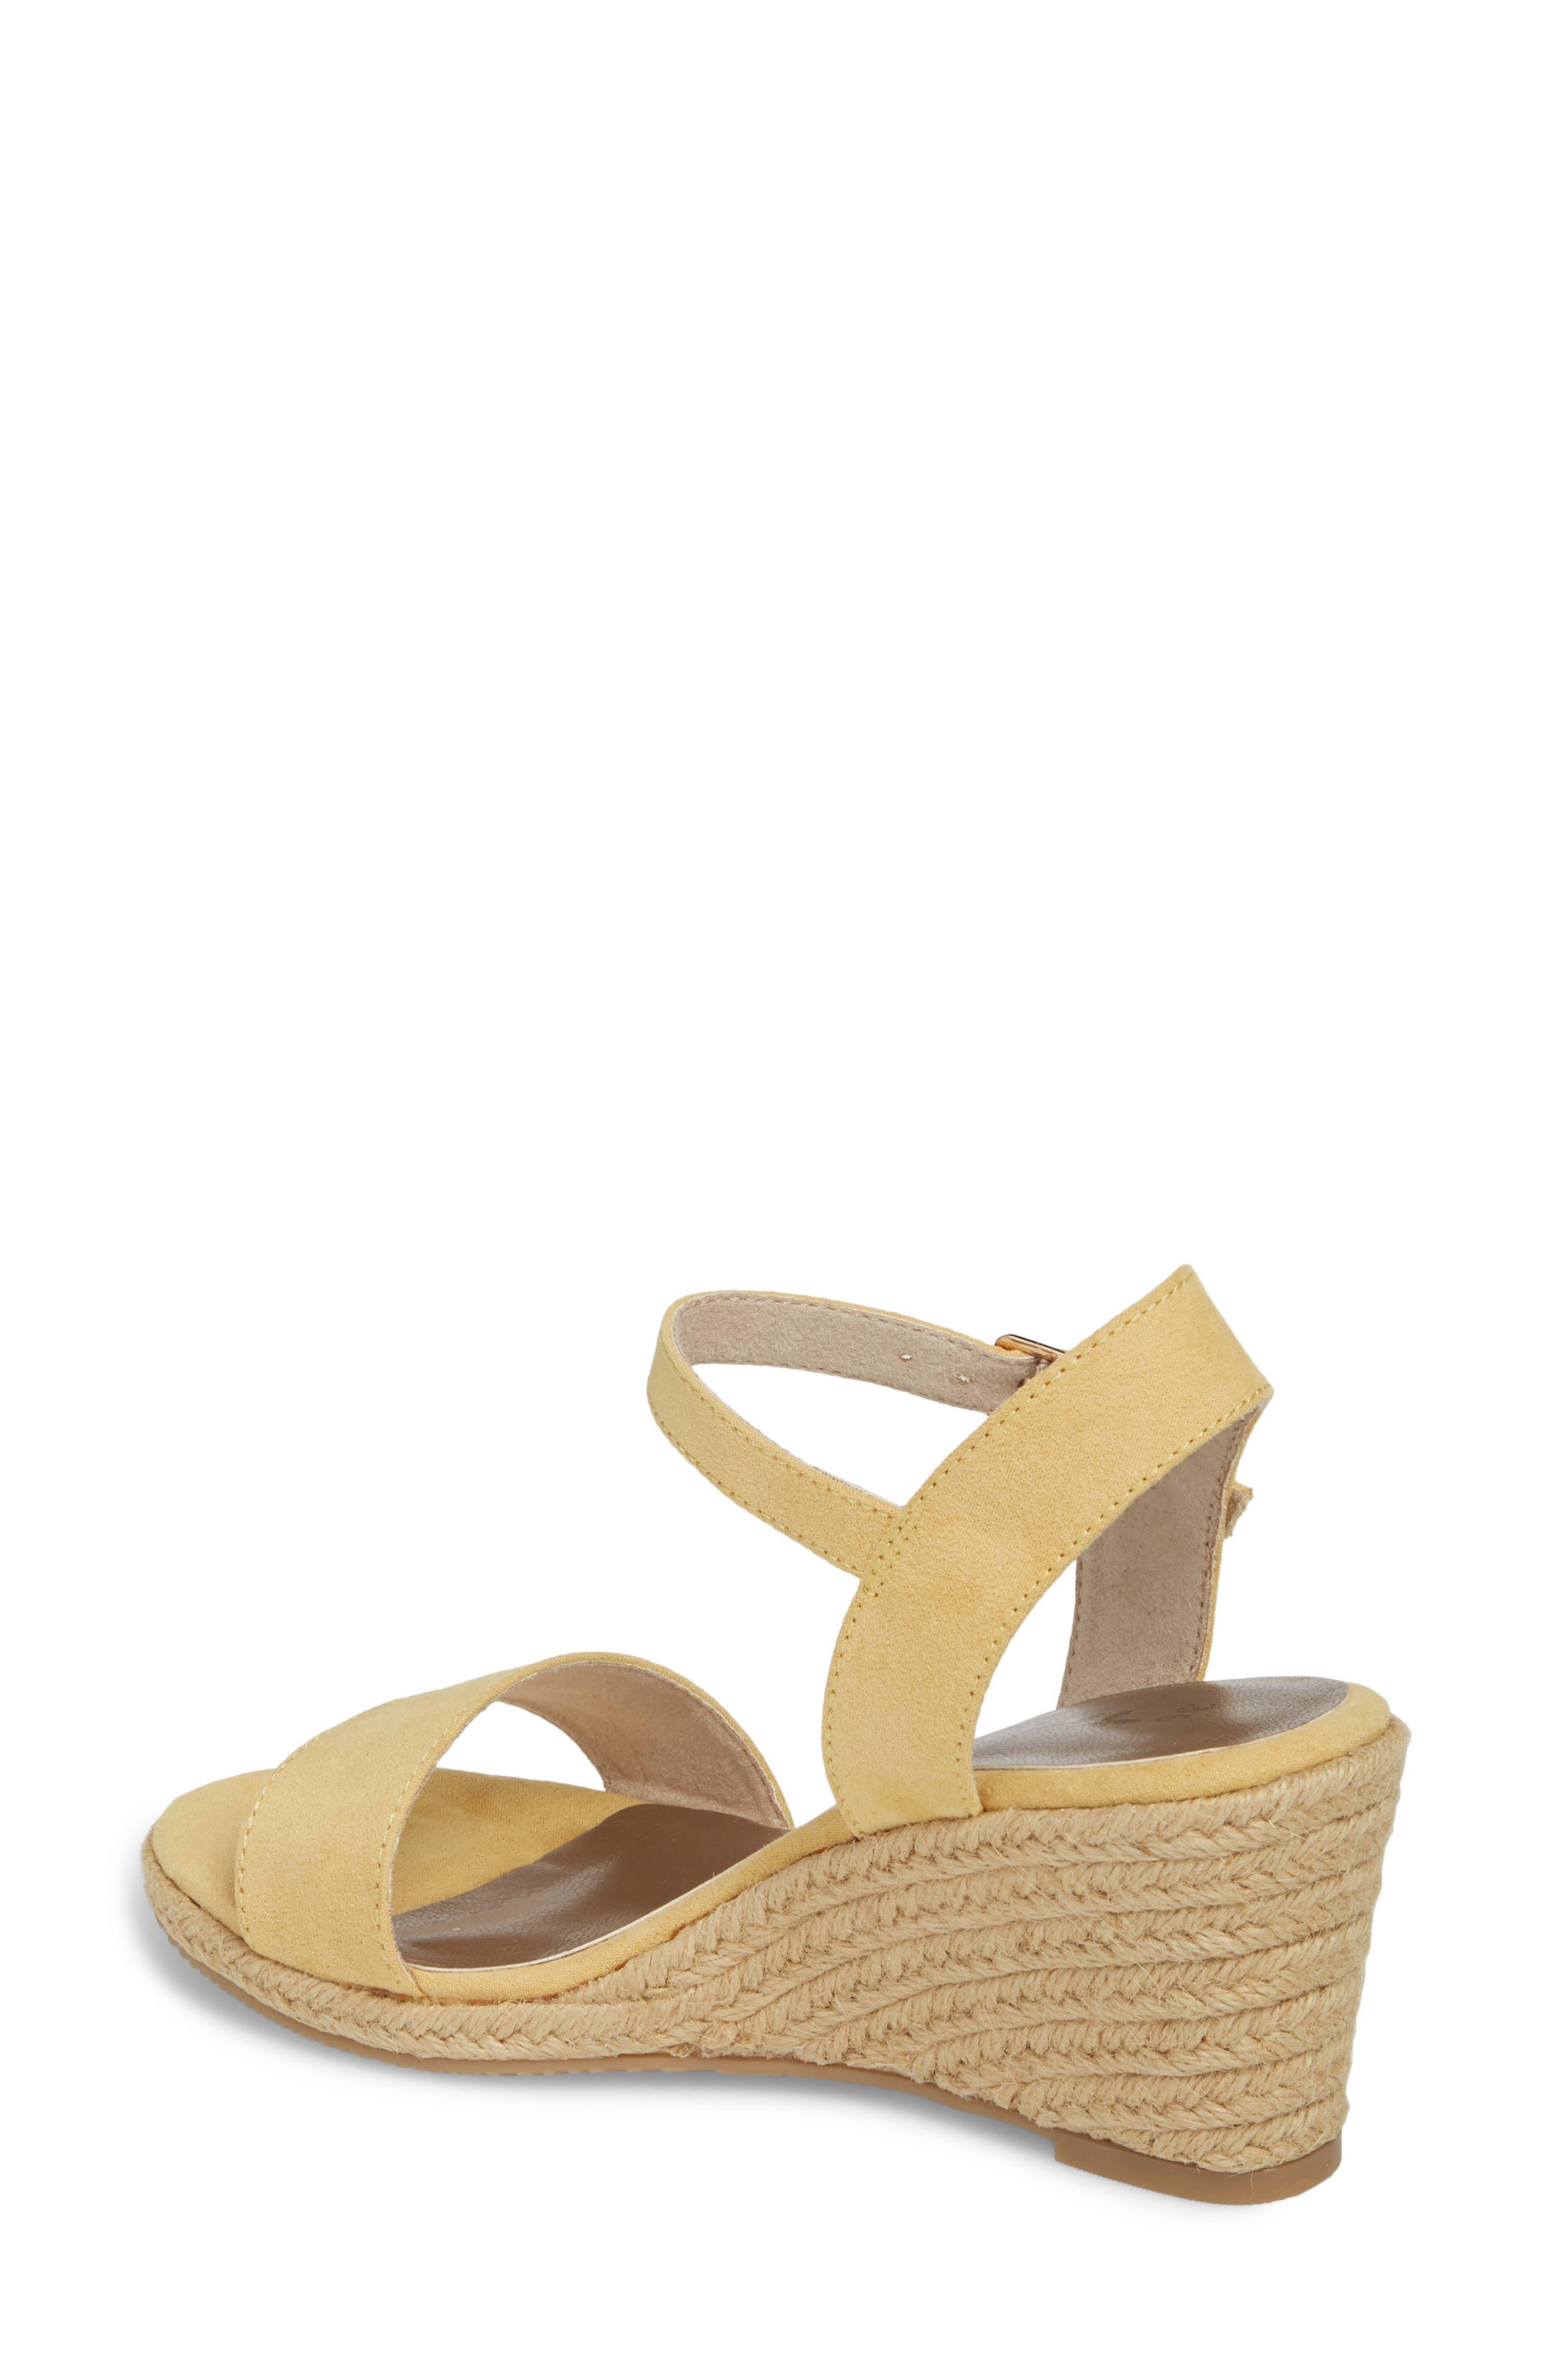 Livia Espadrille Wedge Sandal,                             Alternate thumbnail 2, color,                             Saffron Fabric